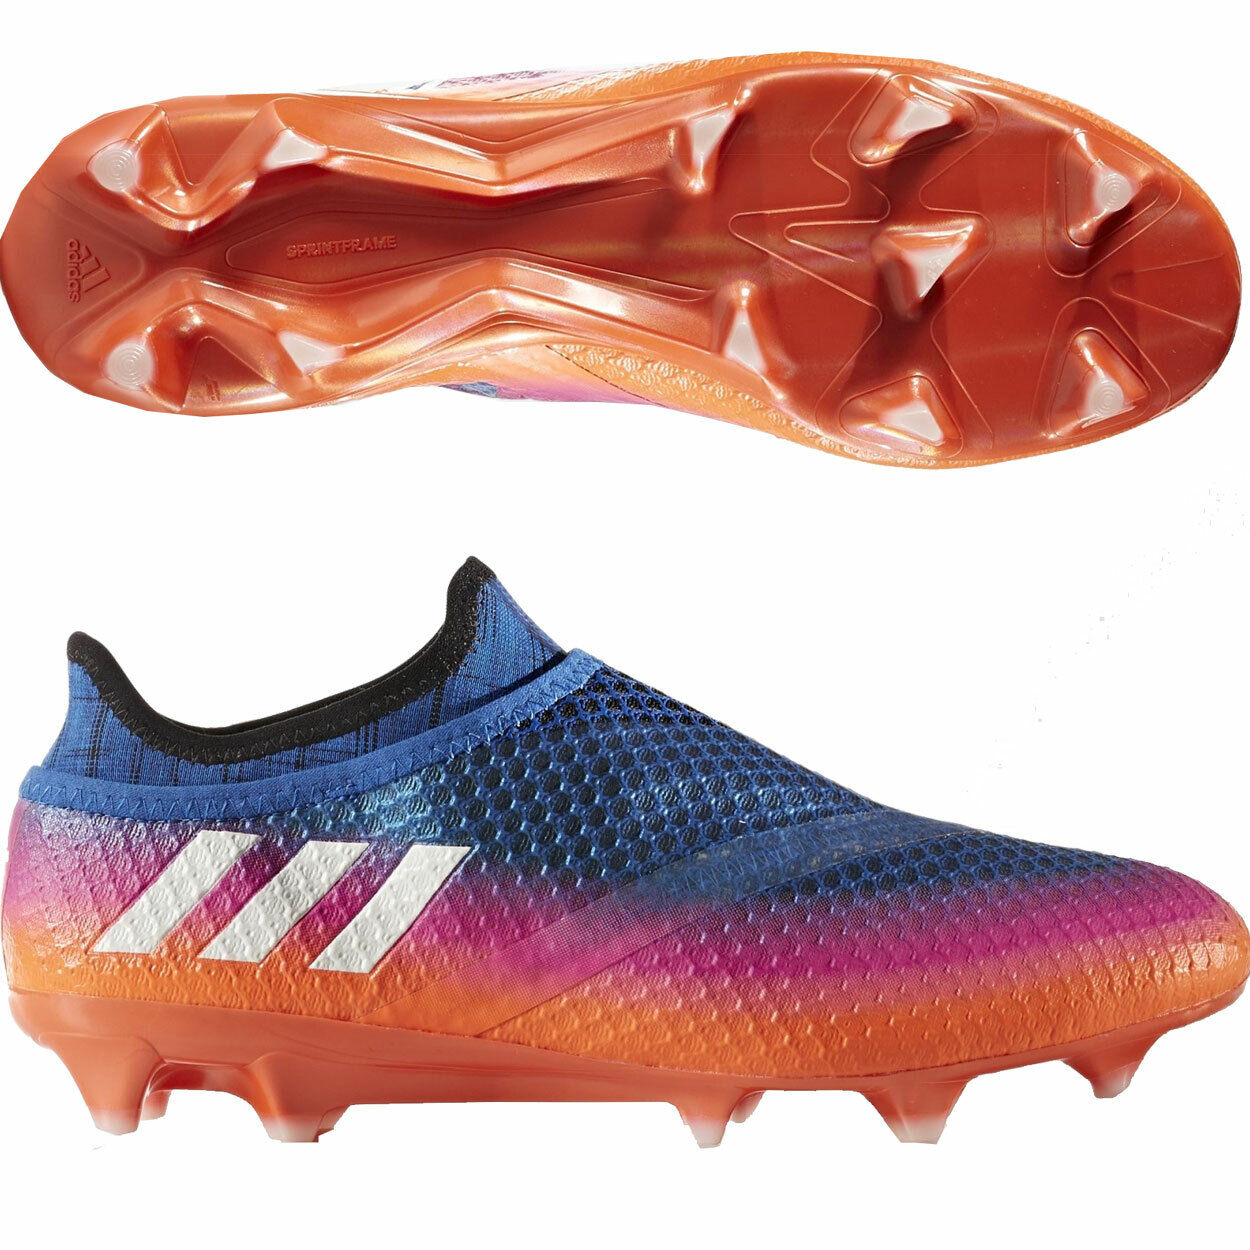 Adidas Messi 16 Pureability FG BB1871